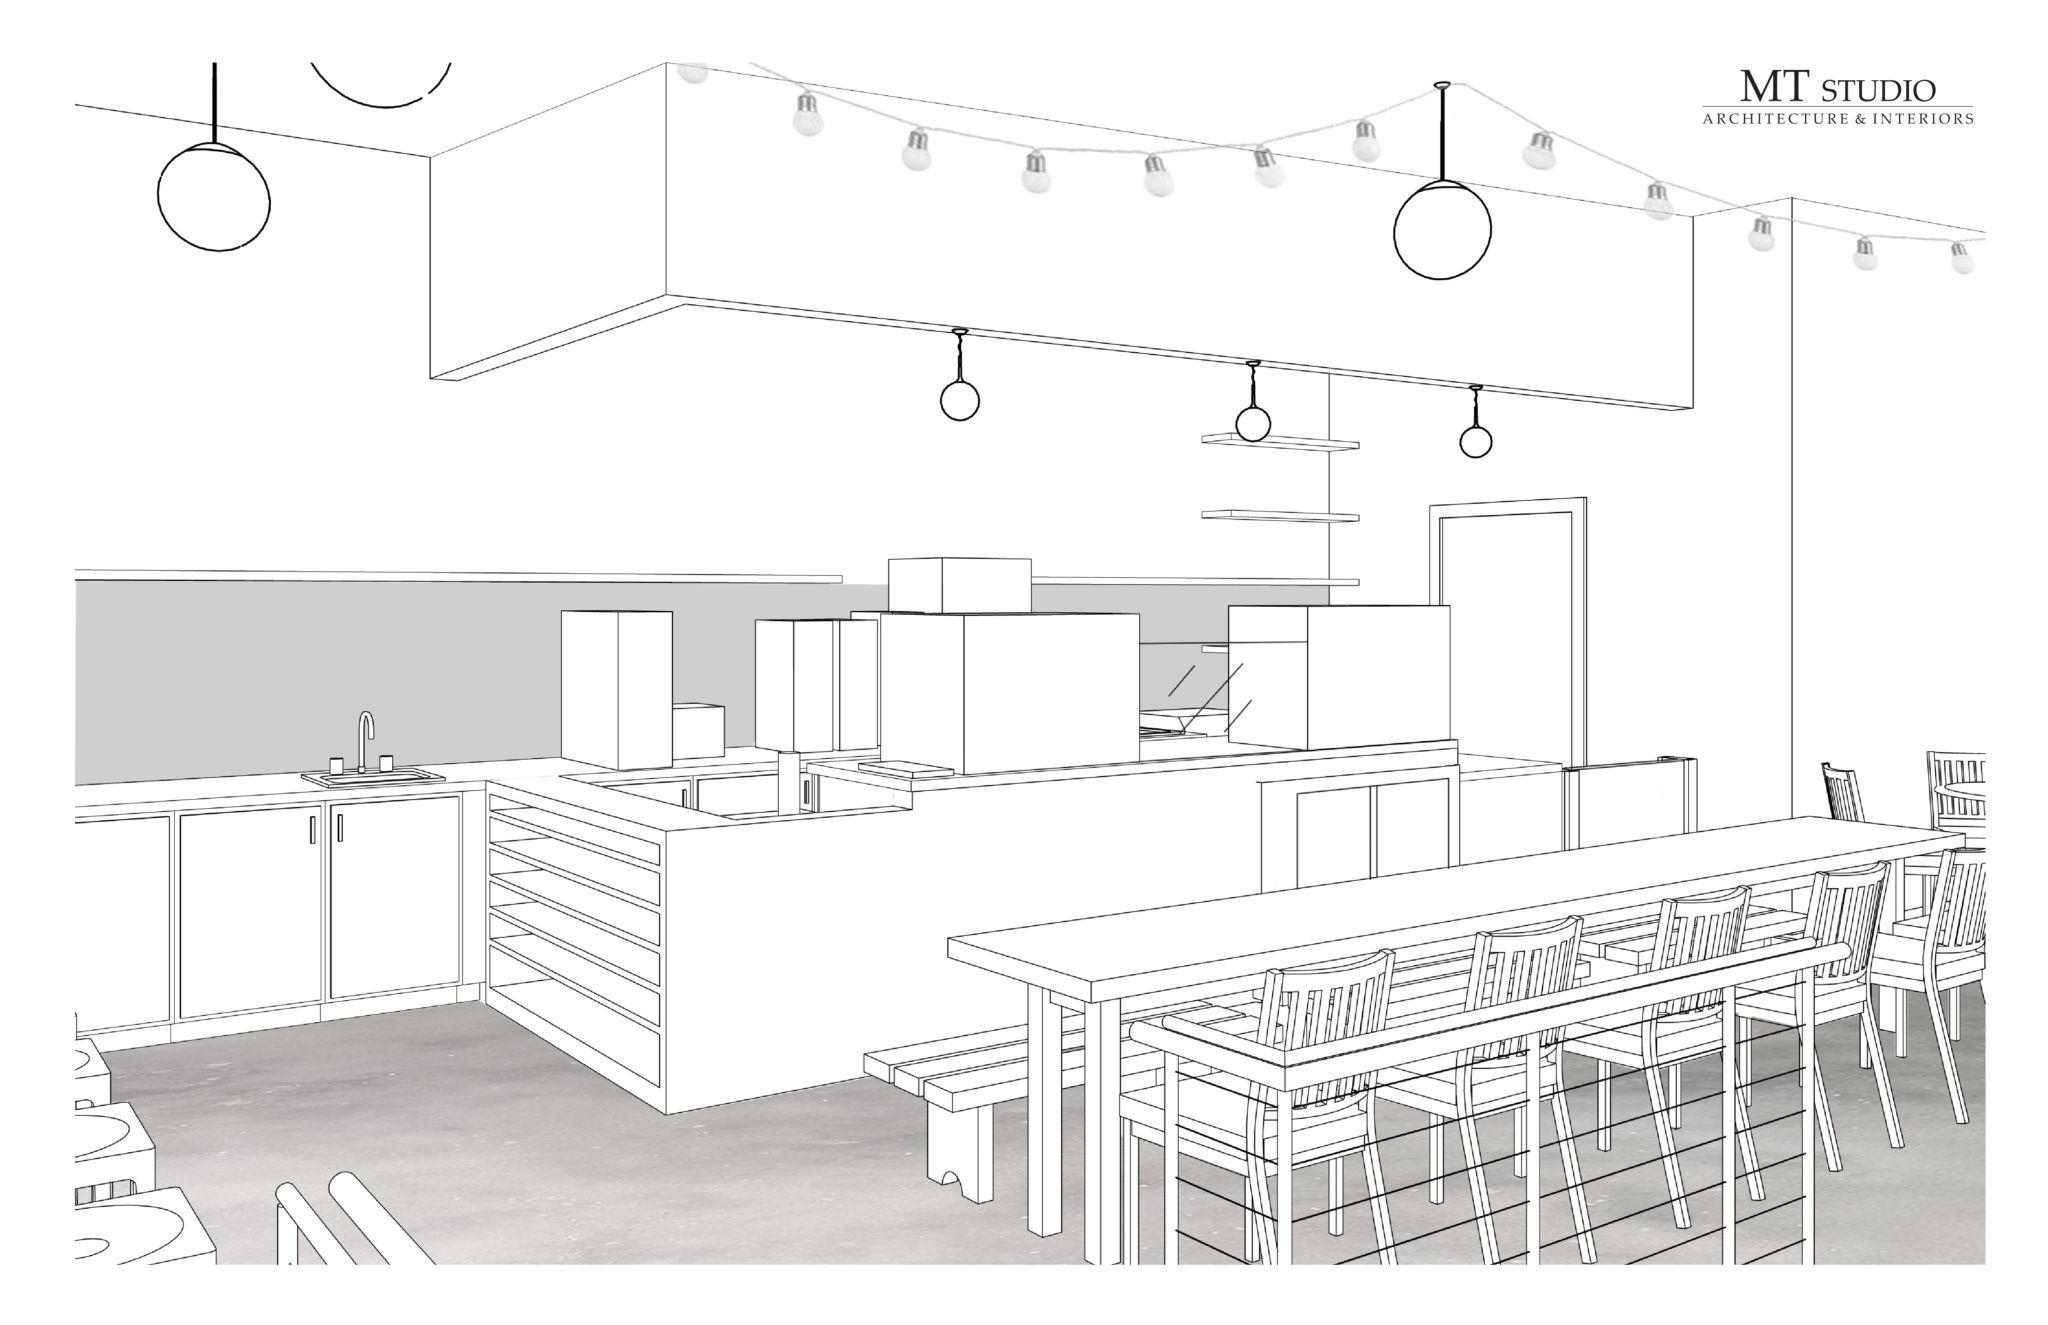 Hodgepodge Coffeehouse Rendering - Moreland Avenue